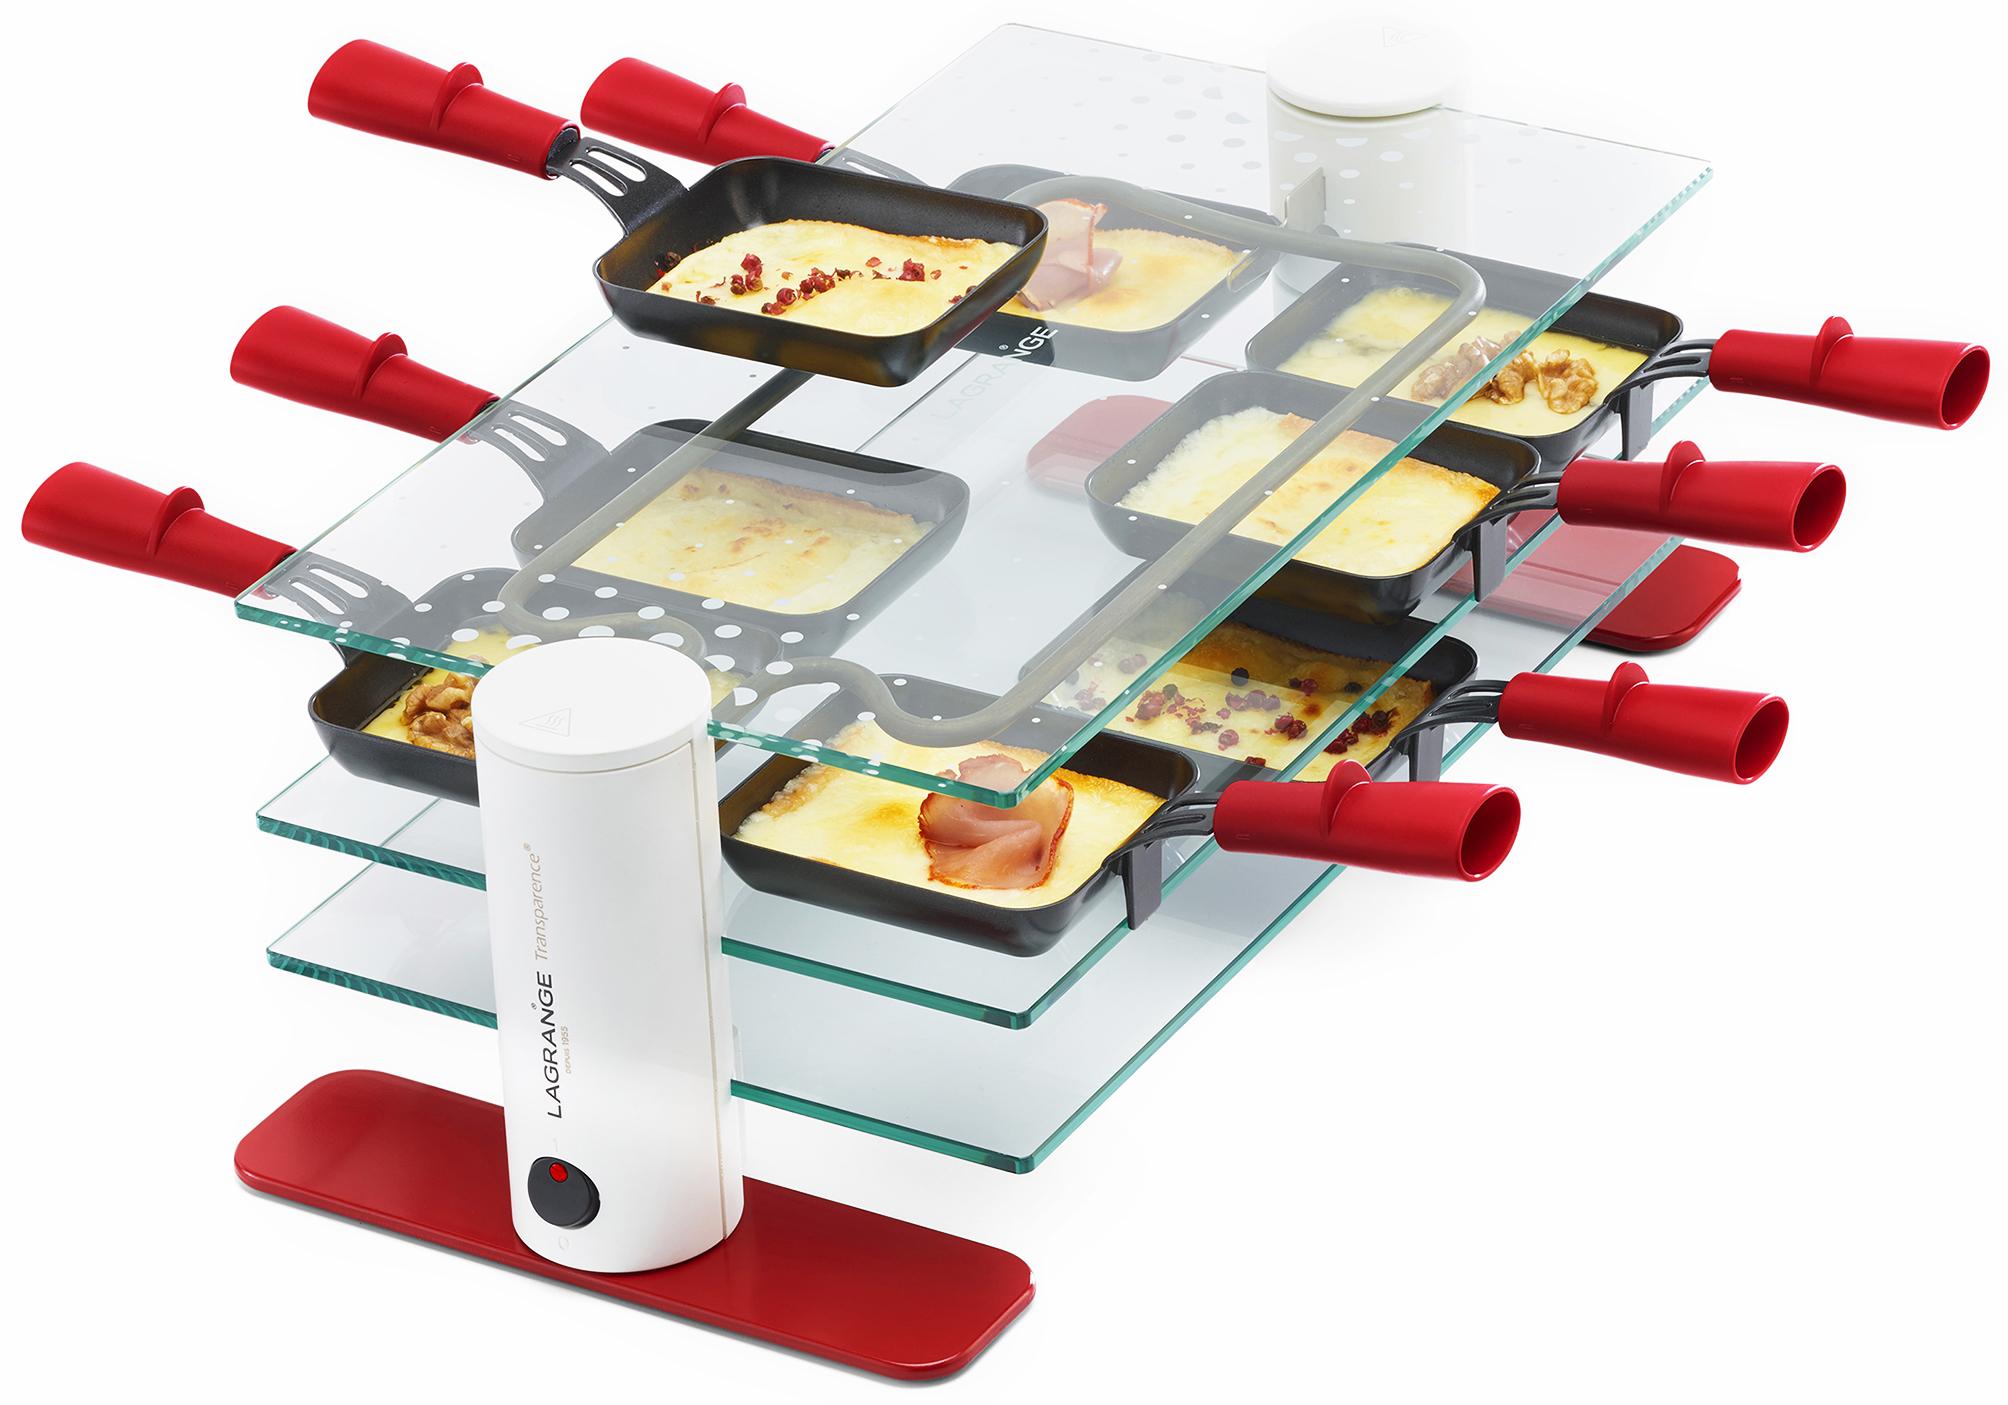 Raclette Transparence Boulanger